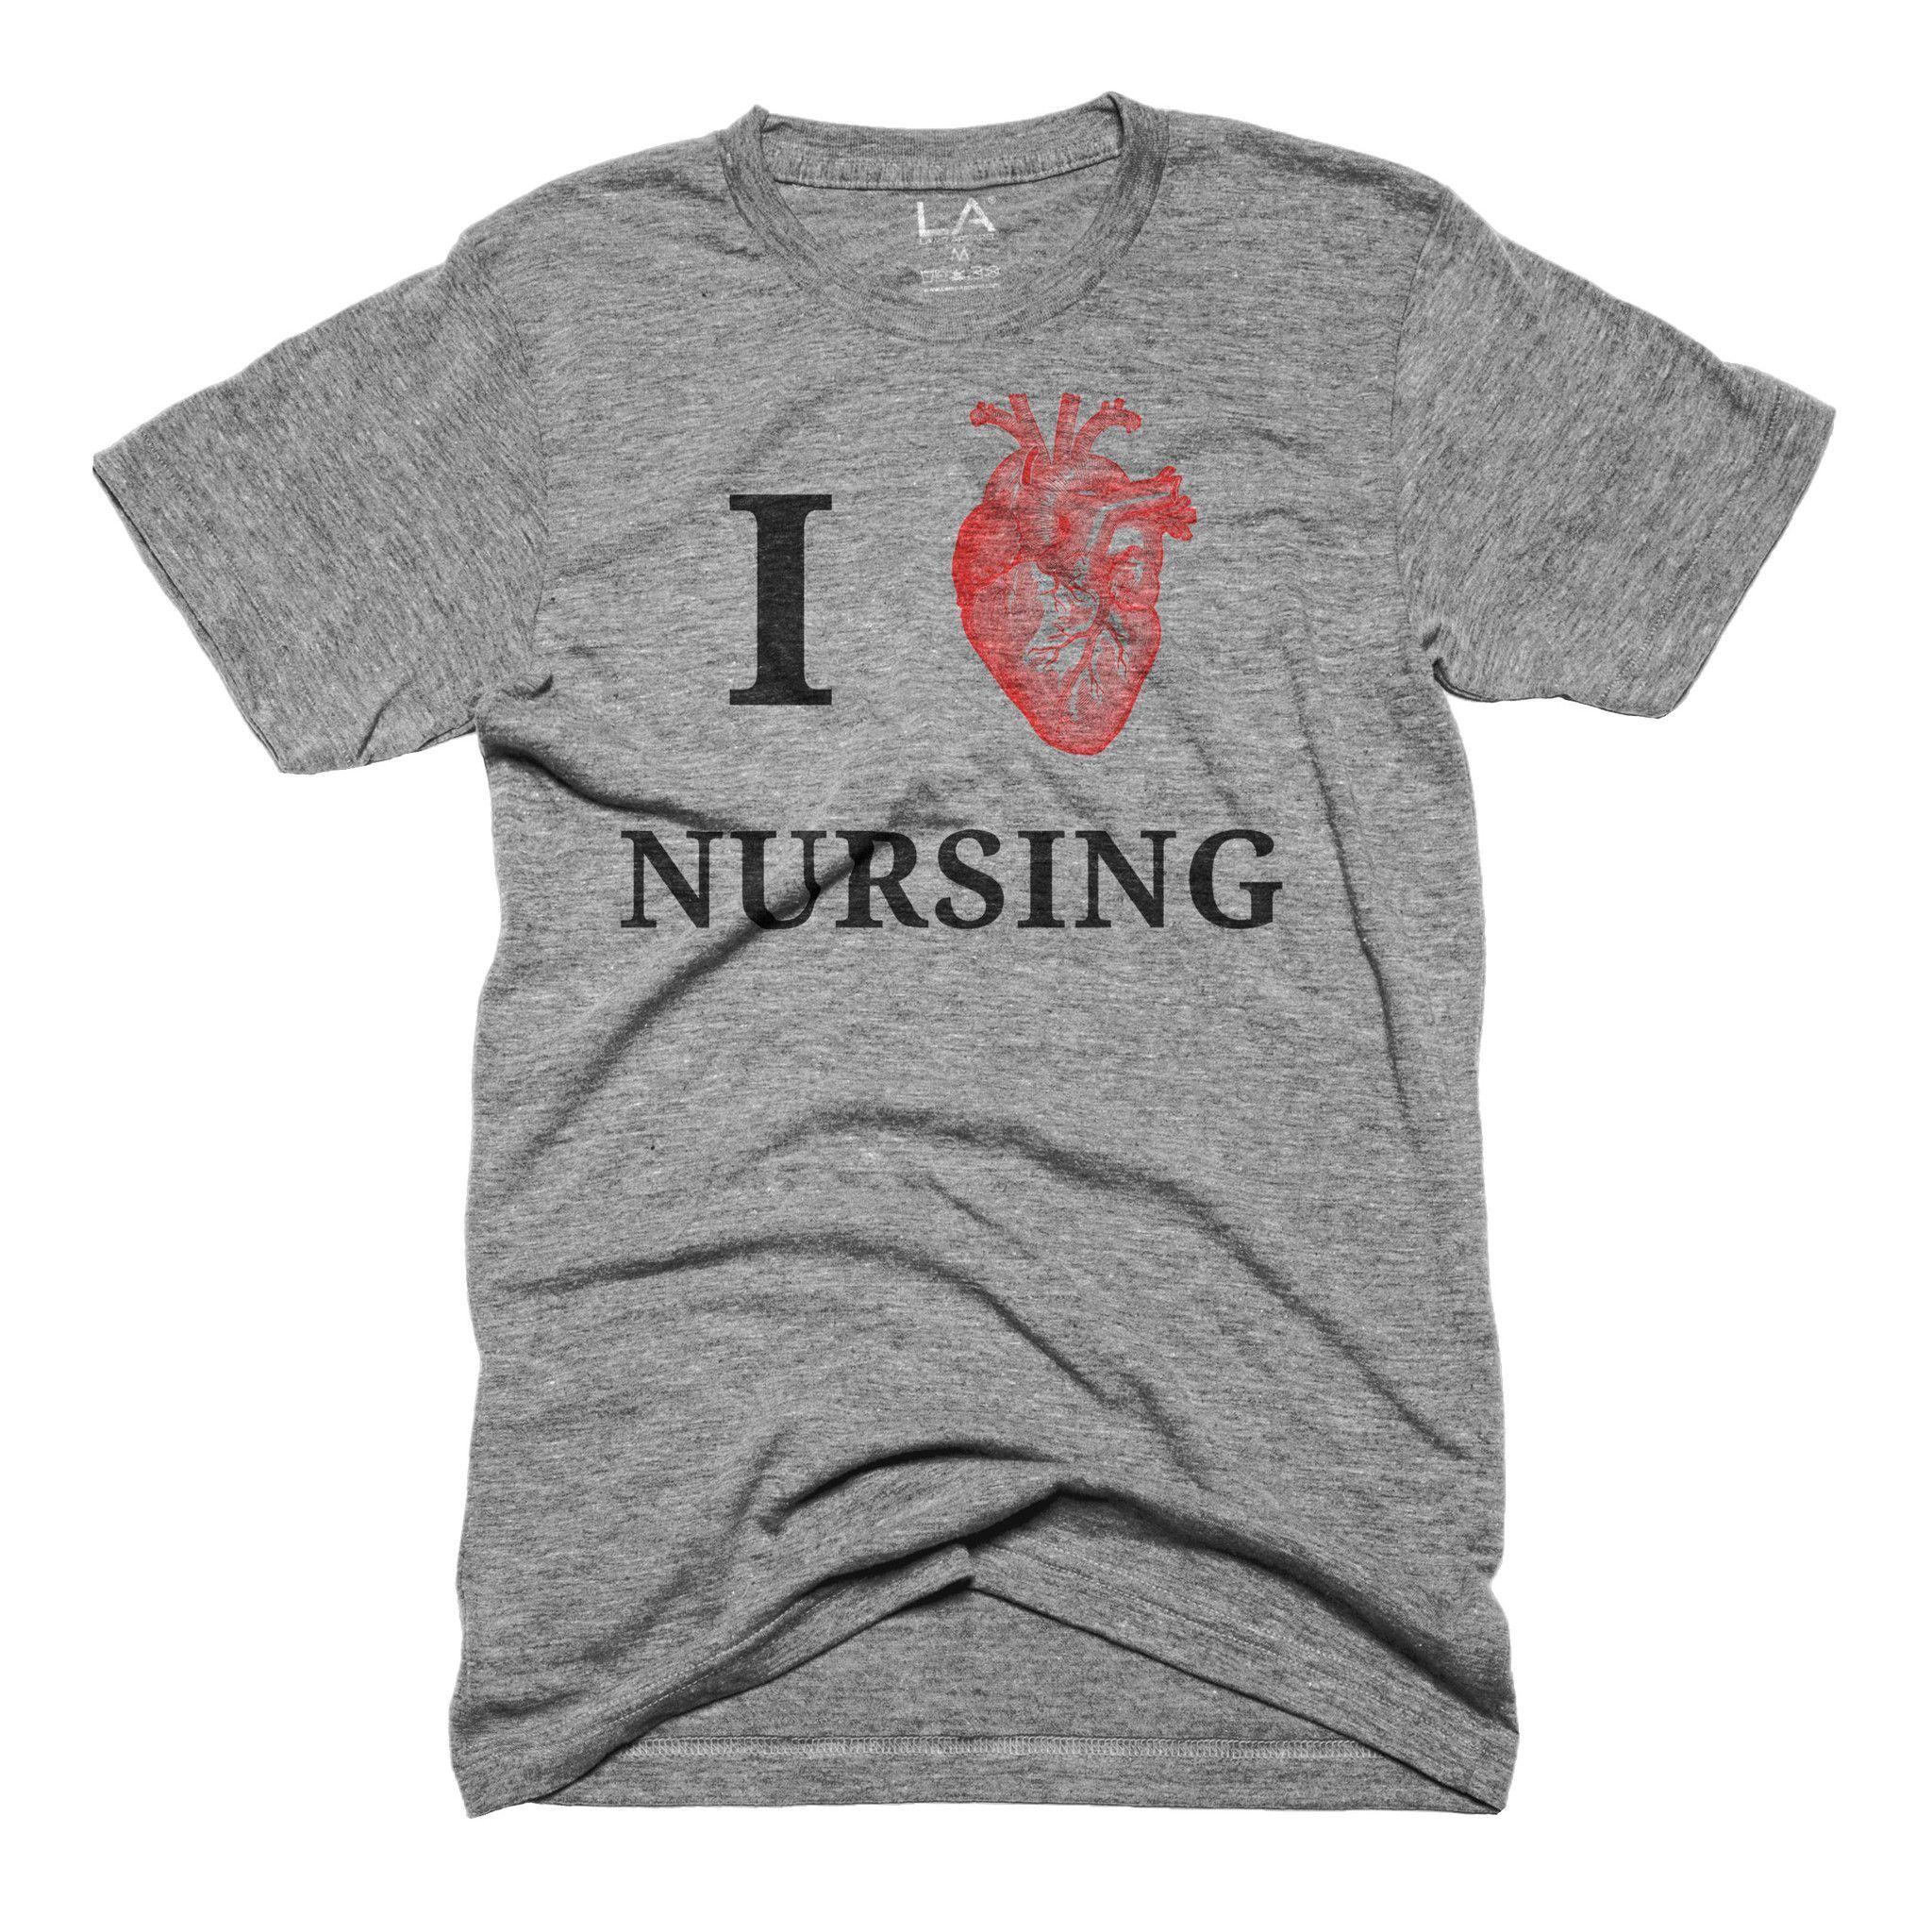 I Love Nursing Shirt from Lamp Apparel www.LampApparel